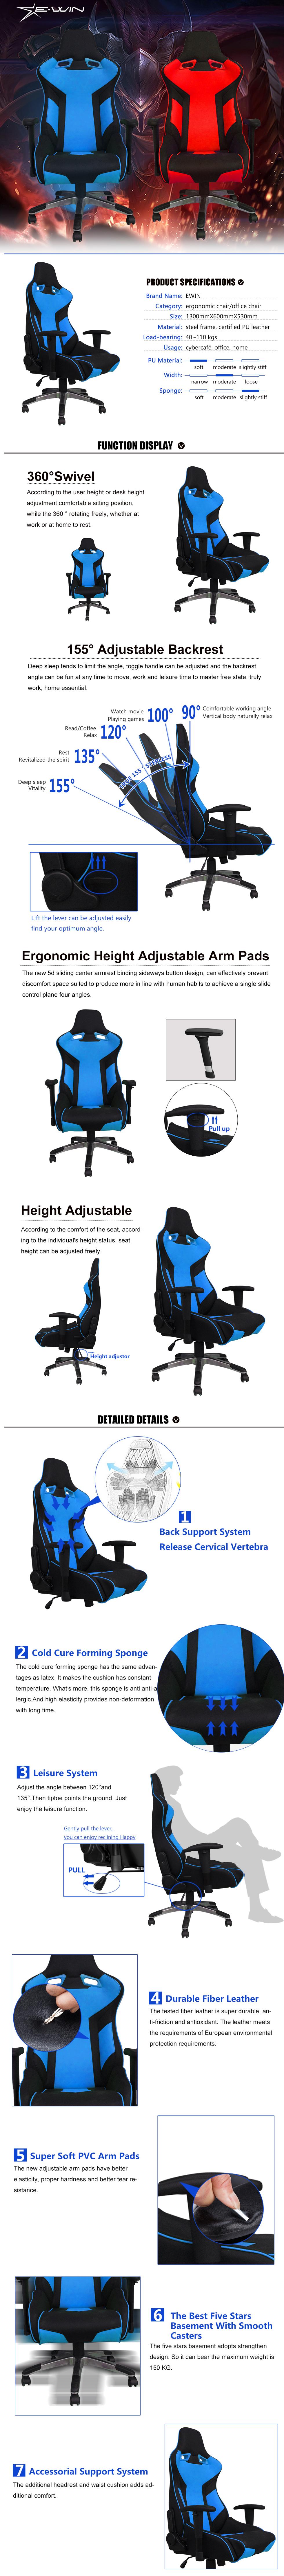 EwinRacing Flash XL series gaming chairs